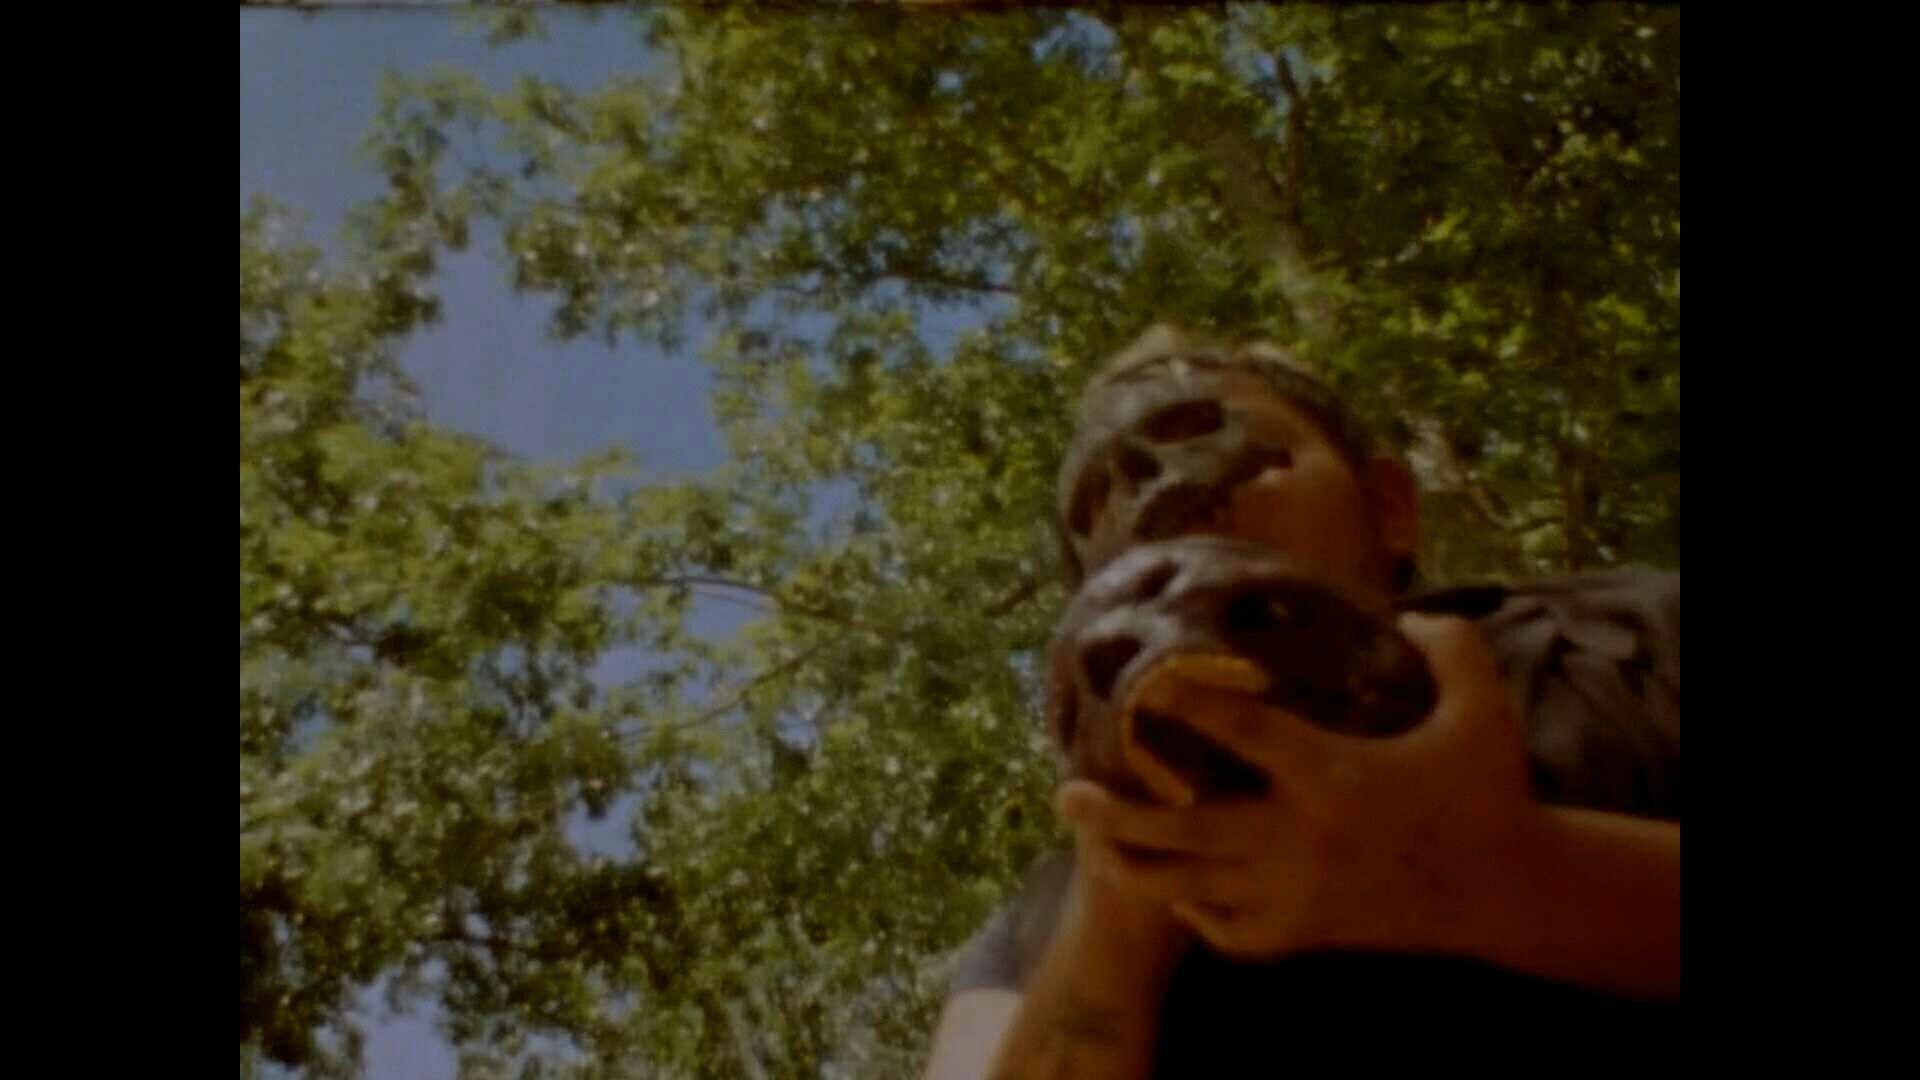 Voodoo Magic Screen Shot Of Debt Magic Screen Voodoo Magic Screen Shot